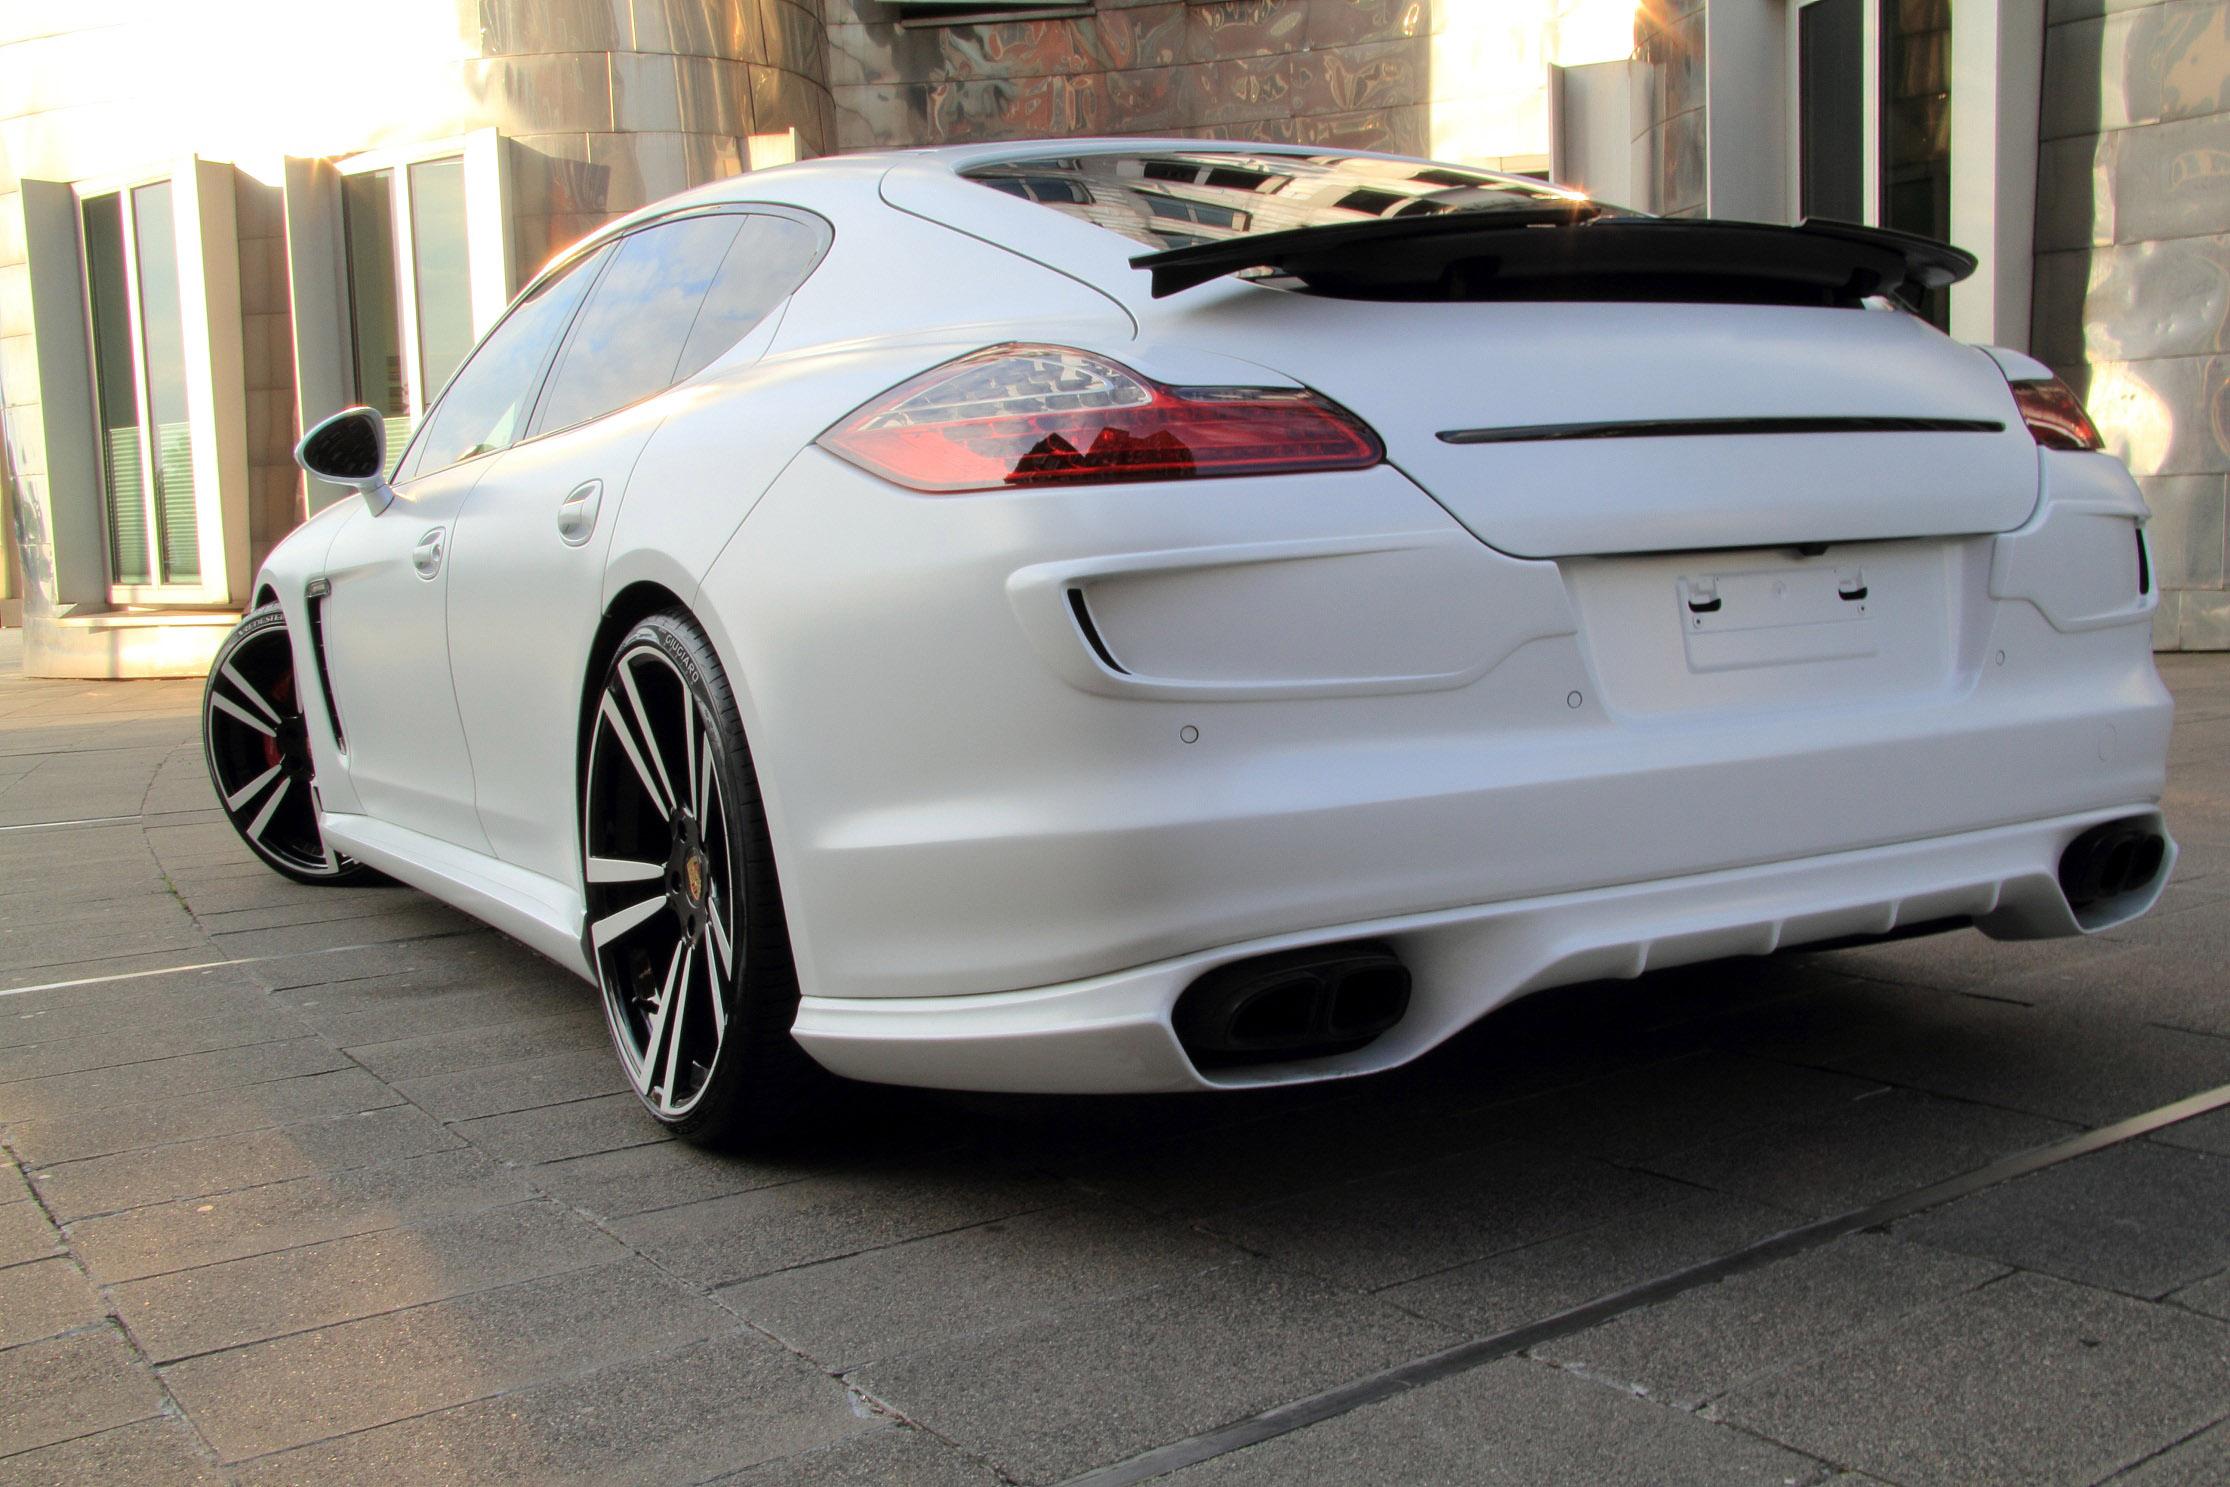 Custom Nissan Maxima >> Porsche Panamera GTS White Storm Edition by Anderson Germany